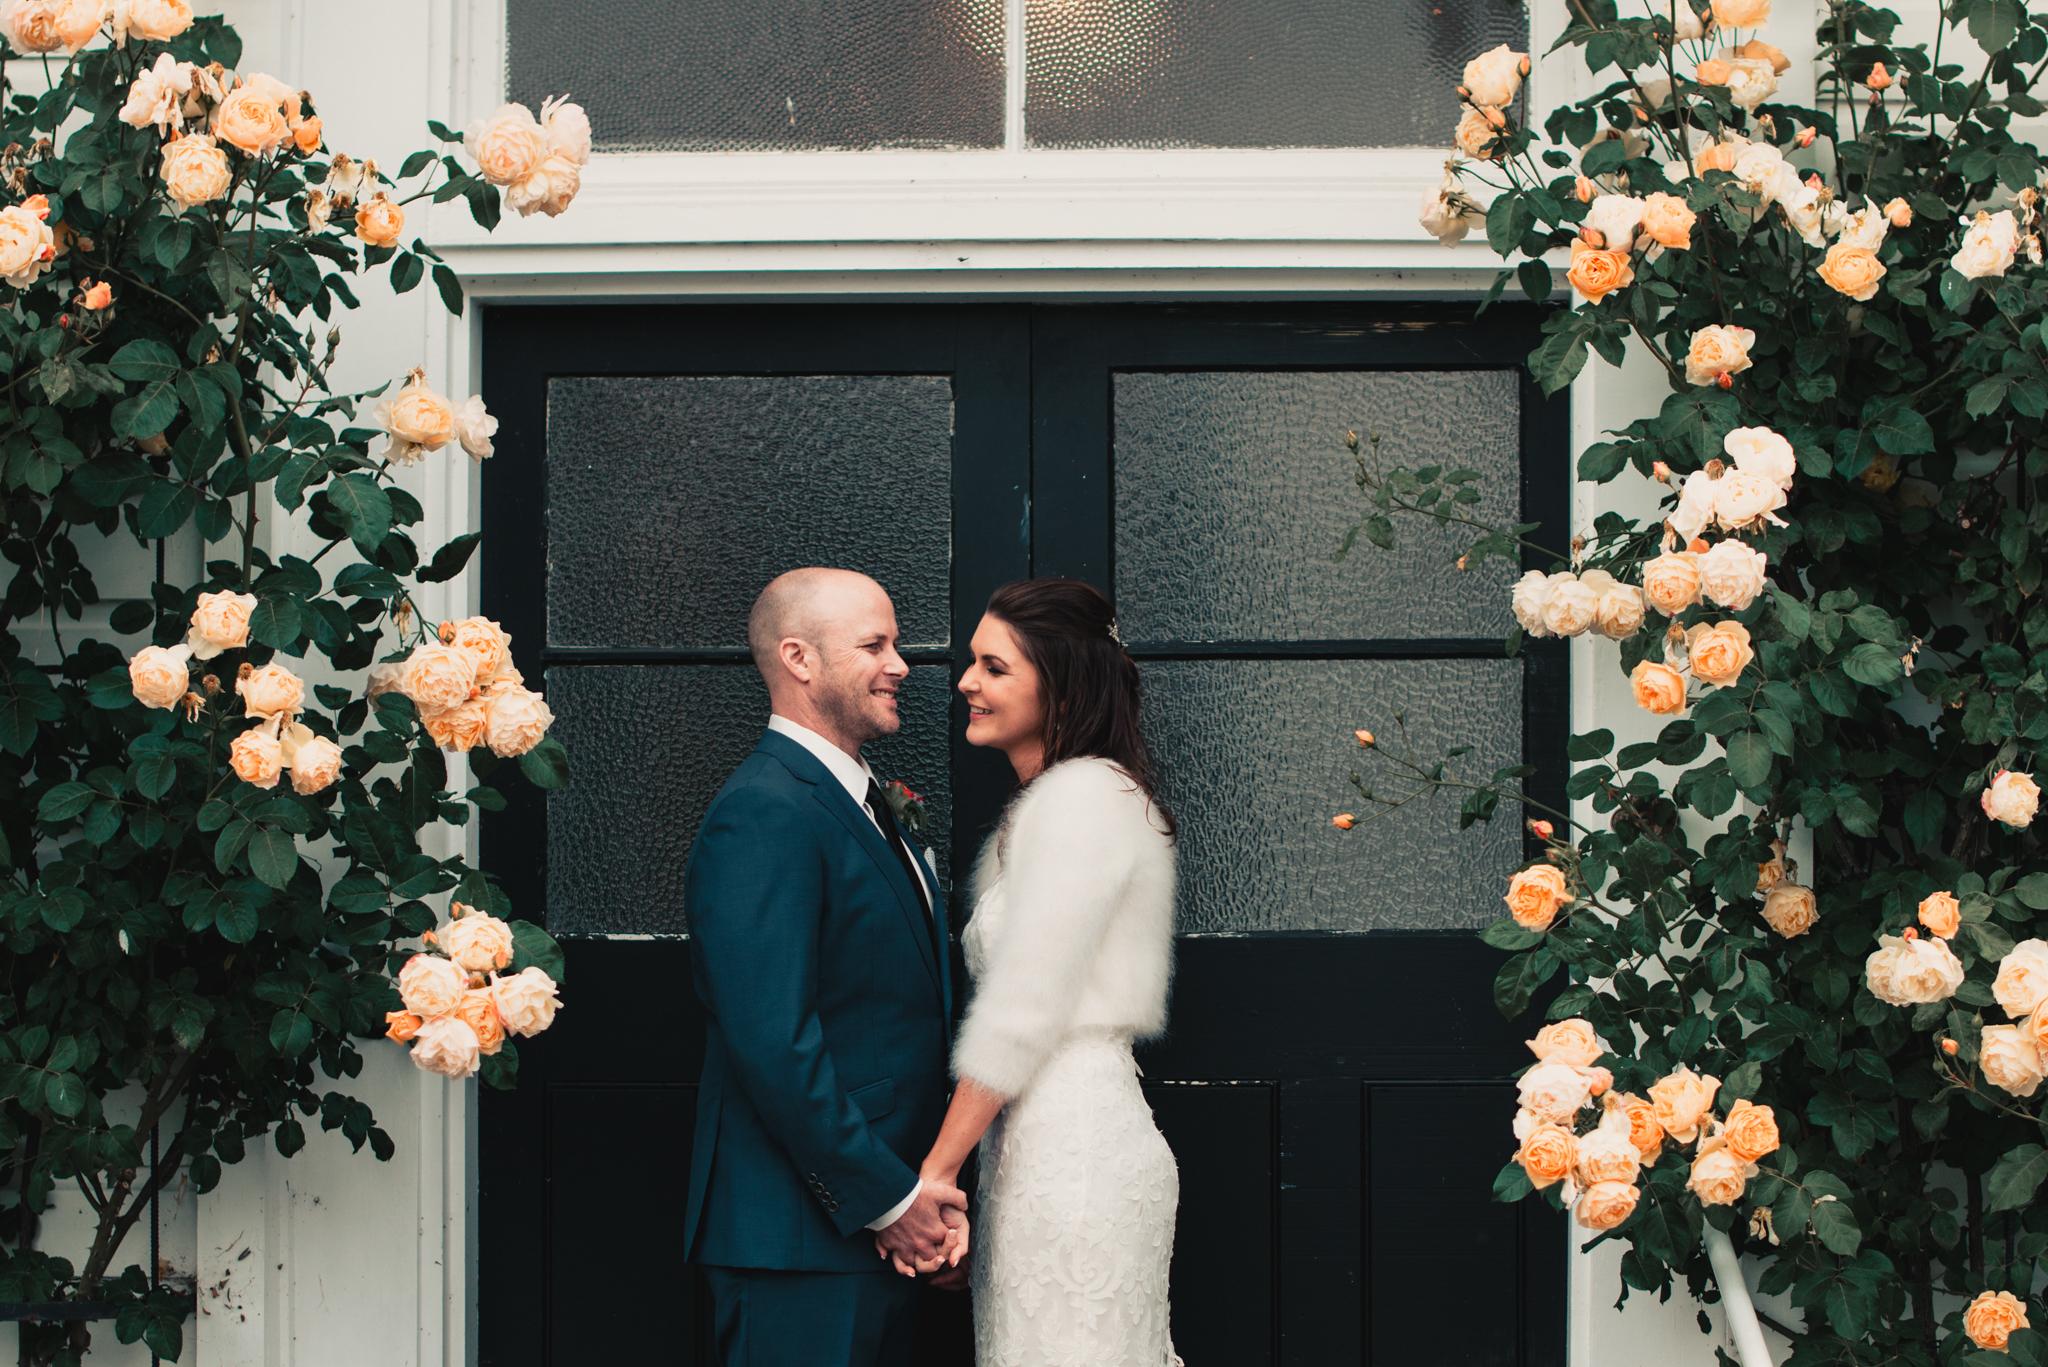 LOVELENSCAPES PHOTOGRAPHY • VISUAL POETRY • NEW ZEALAND WEDDING PHOTOGRAPHER • AUSTRALIAN WEDDING PHOTOGRAPHER • BRISBANE • MELBOURNE • SYDNEY • HOBART • TARUREKA ESTATE • ANNA CAMPBELL • 156.jpg